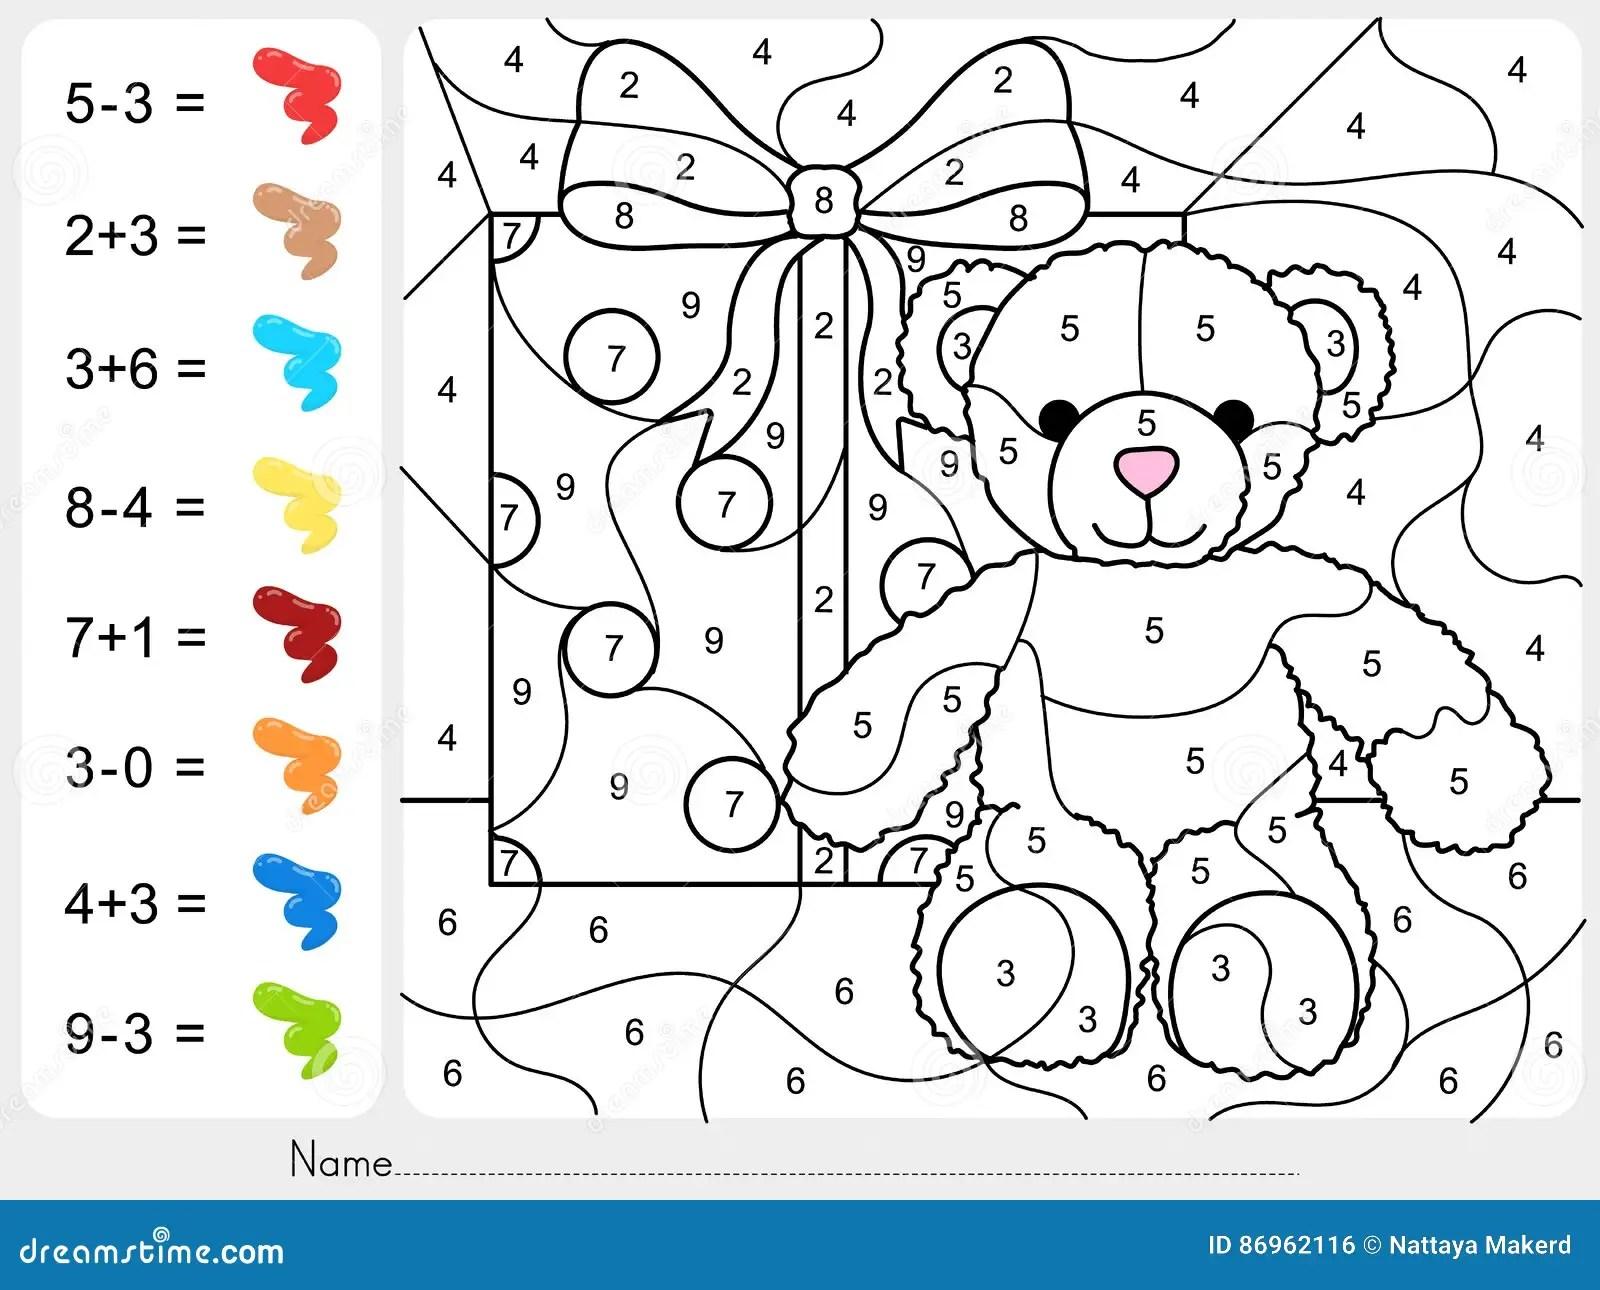 Adding Worksheet Thanksgiving Color By Number